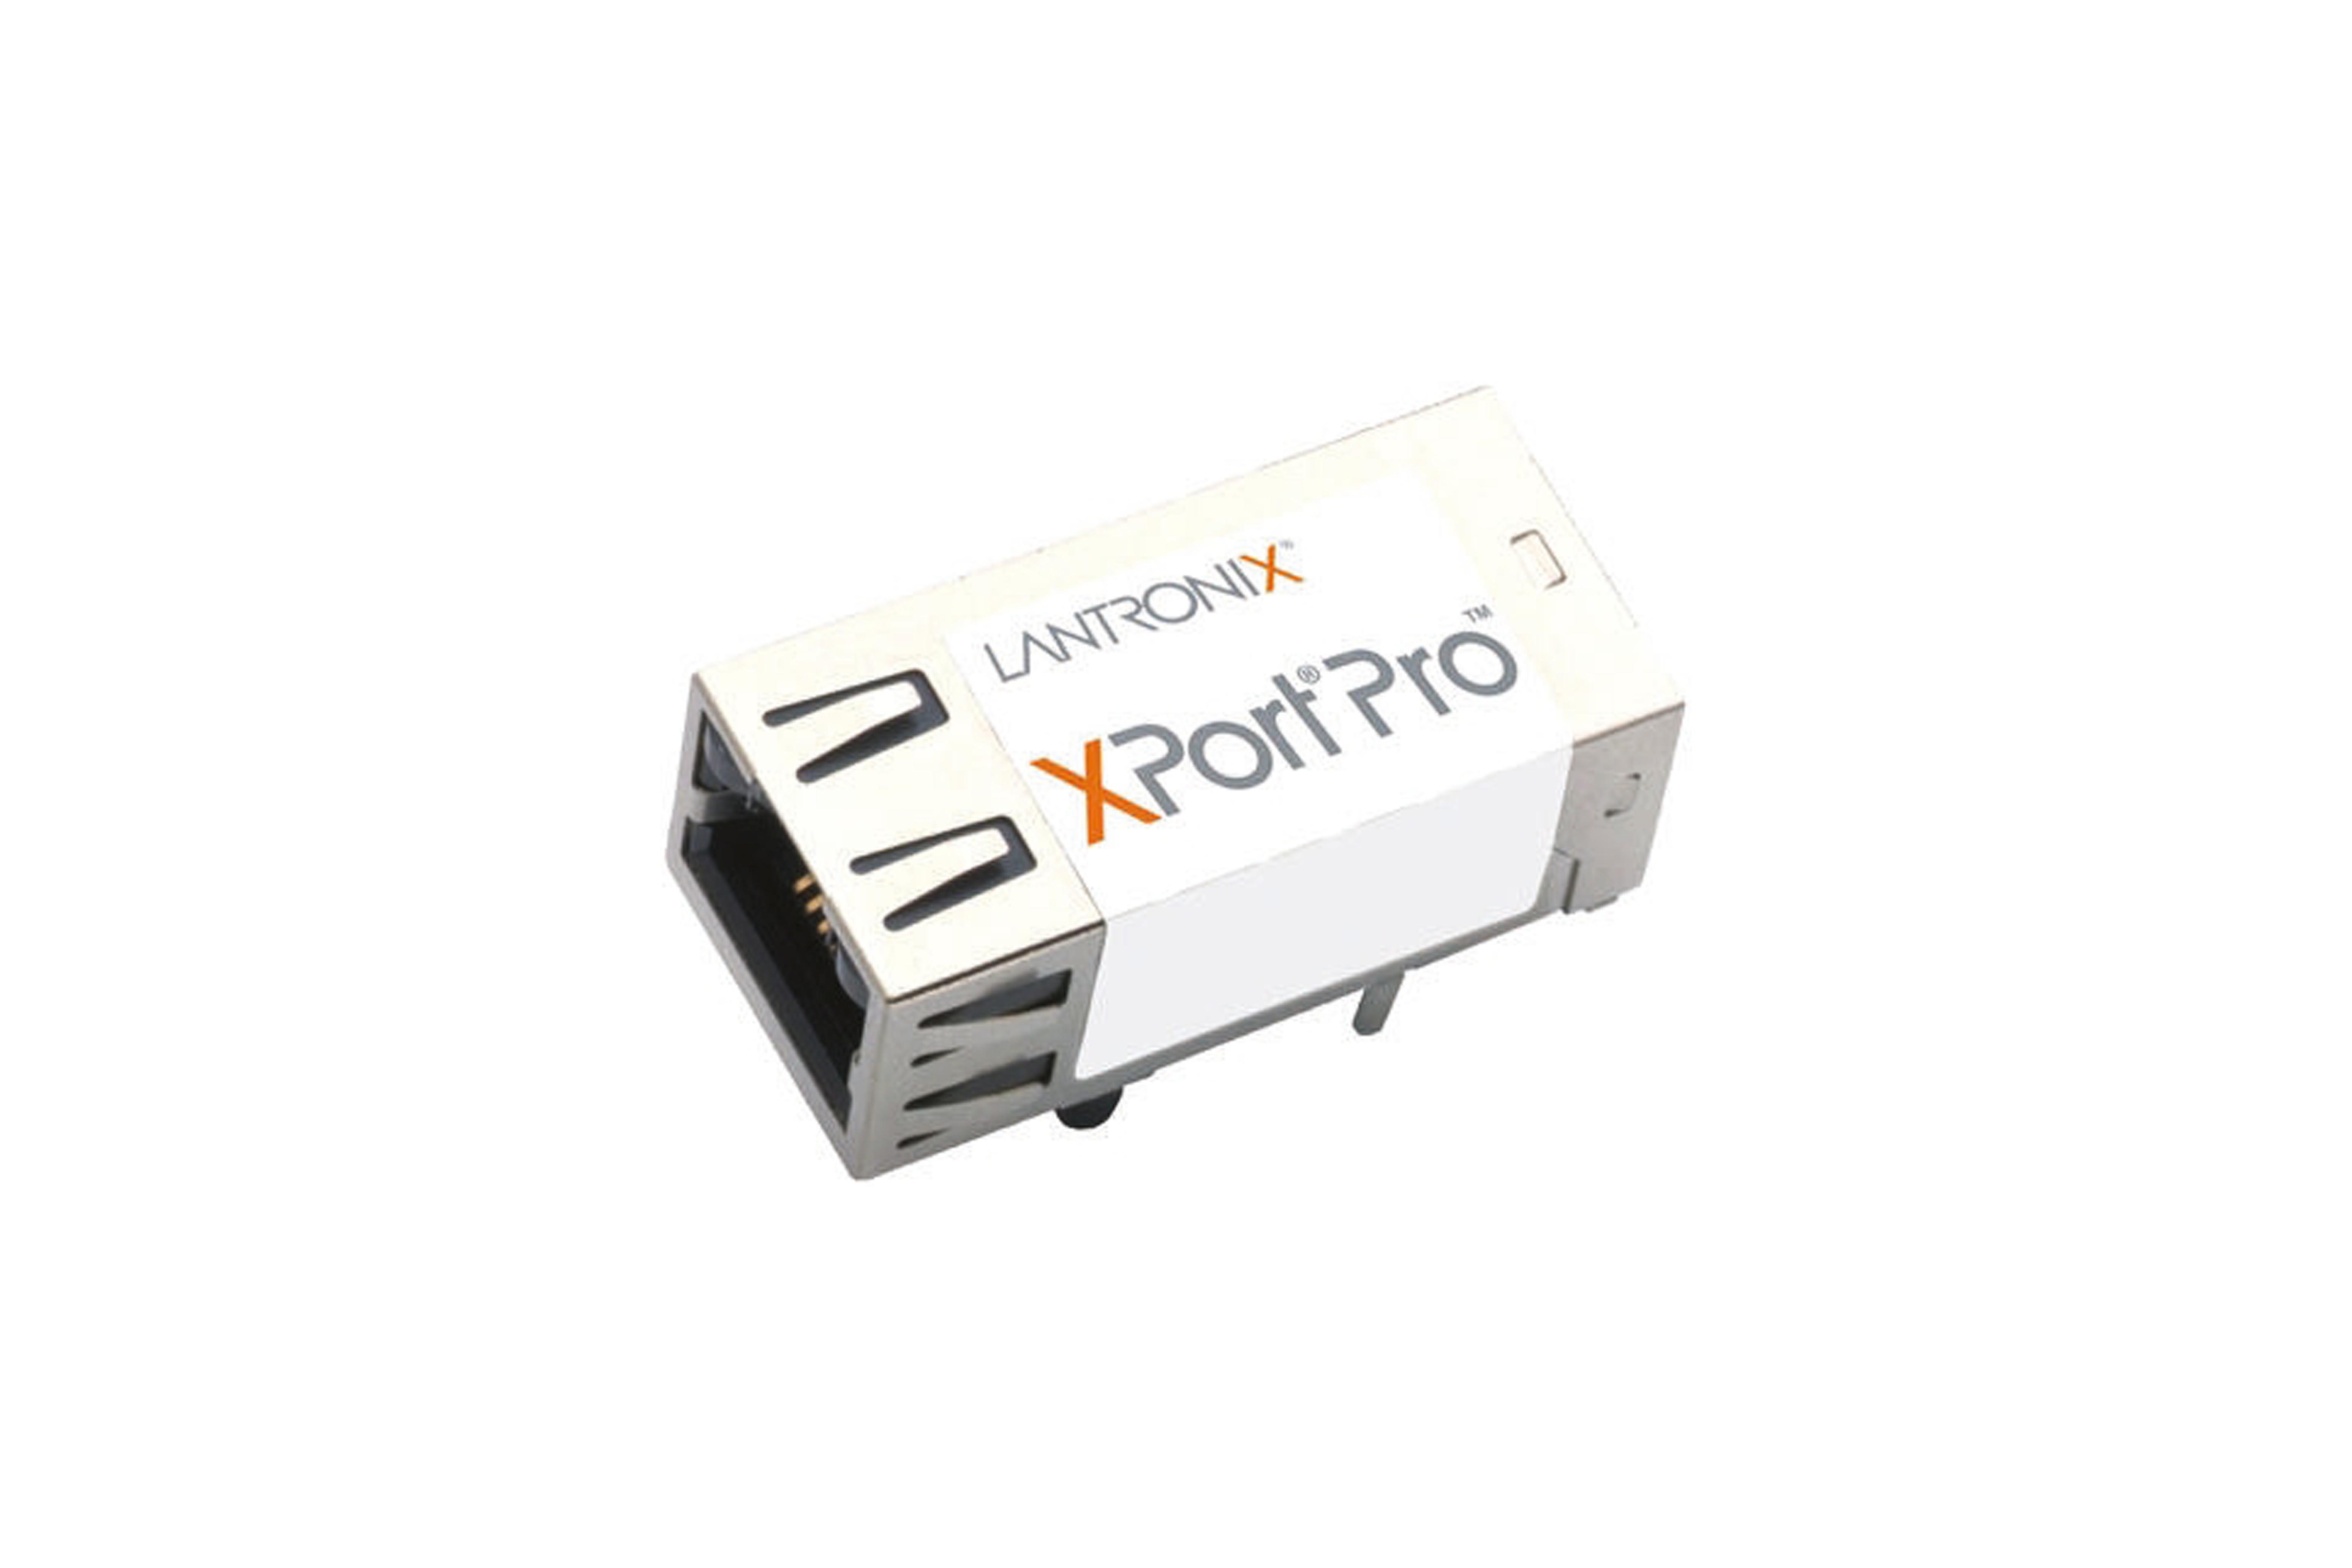 XPort Pro Extended SRAM Temp met encryptie